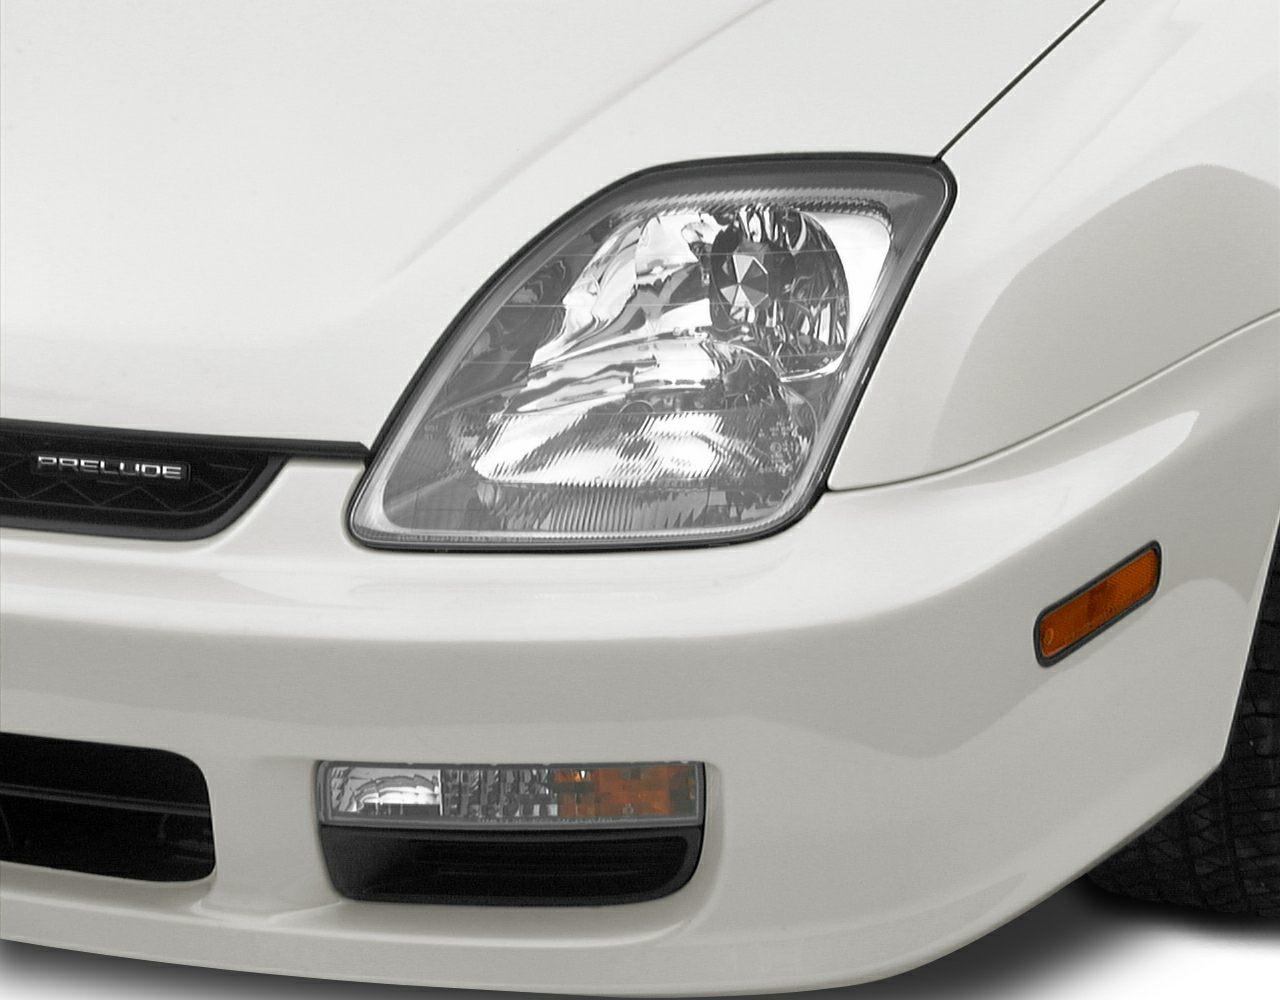 2000 Honda Prelude Exterior Photo